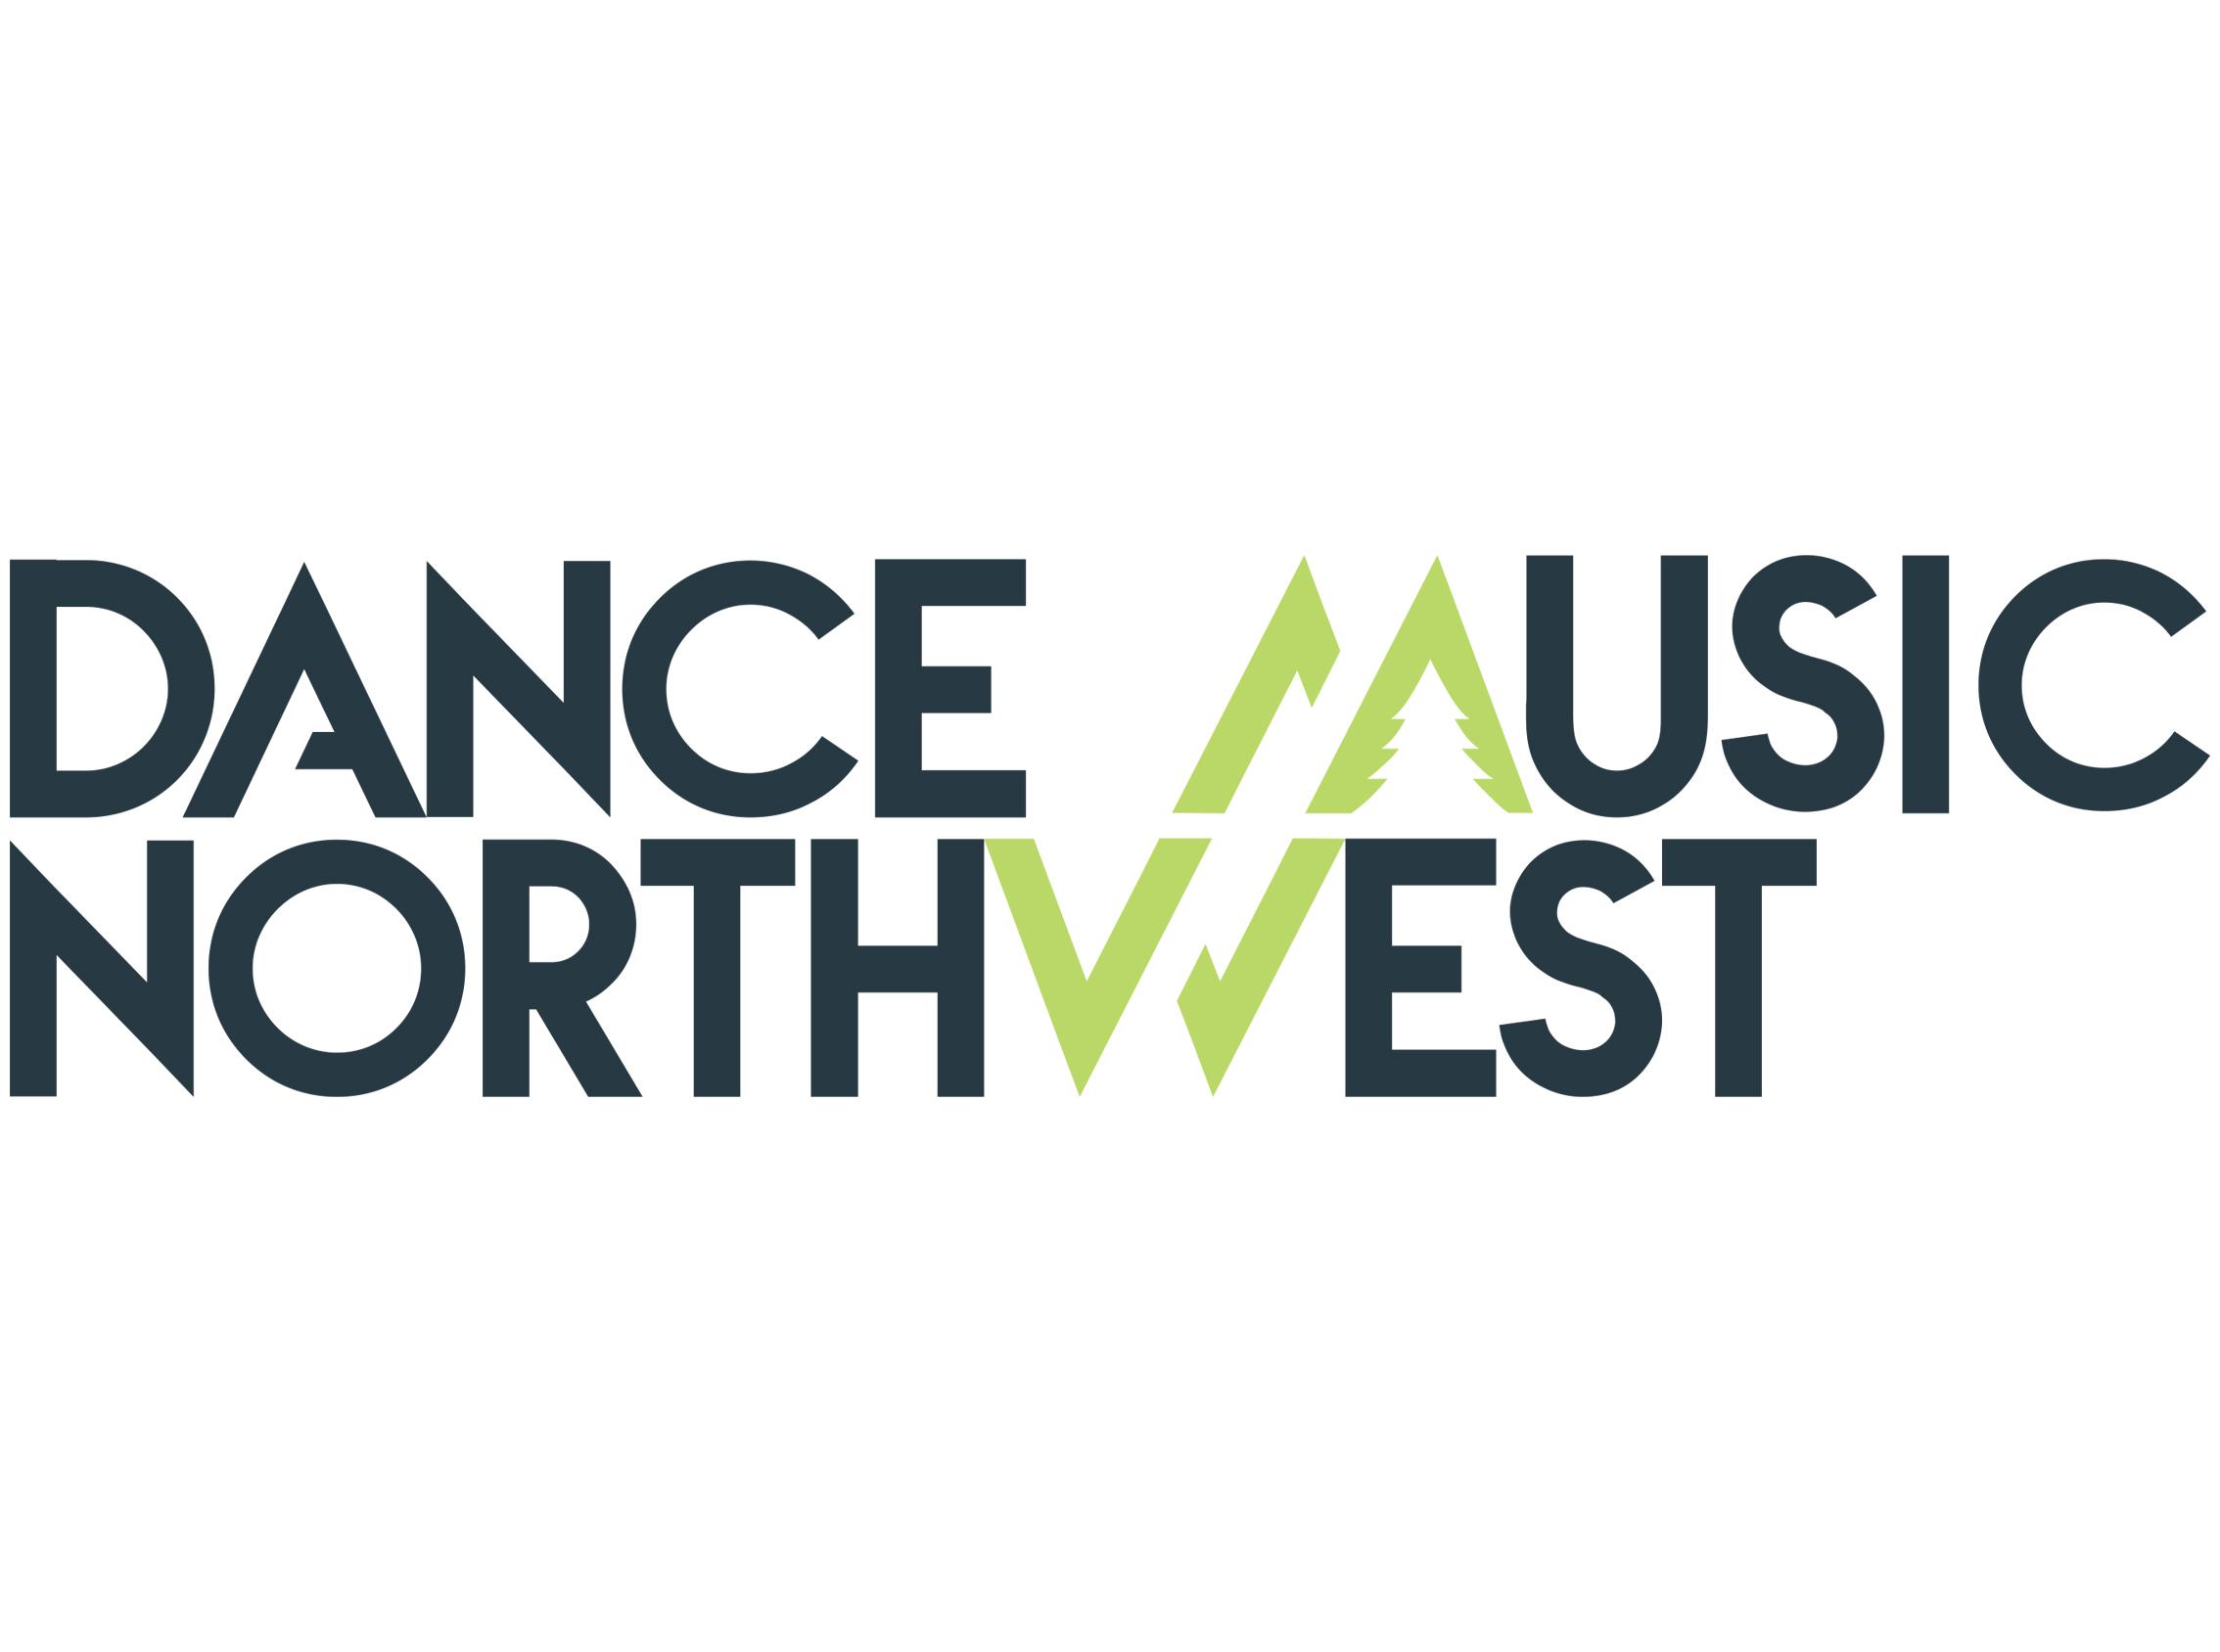 Dance Music Northwest -